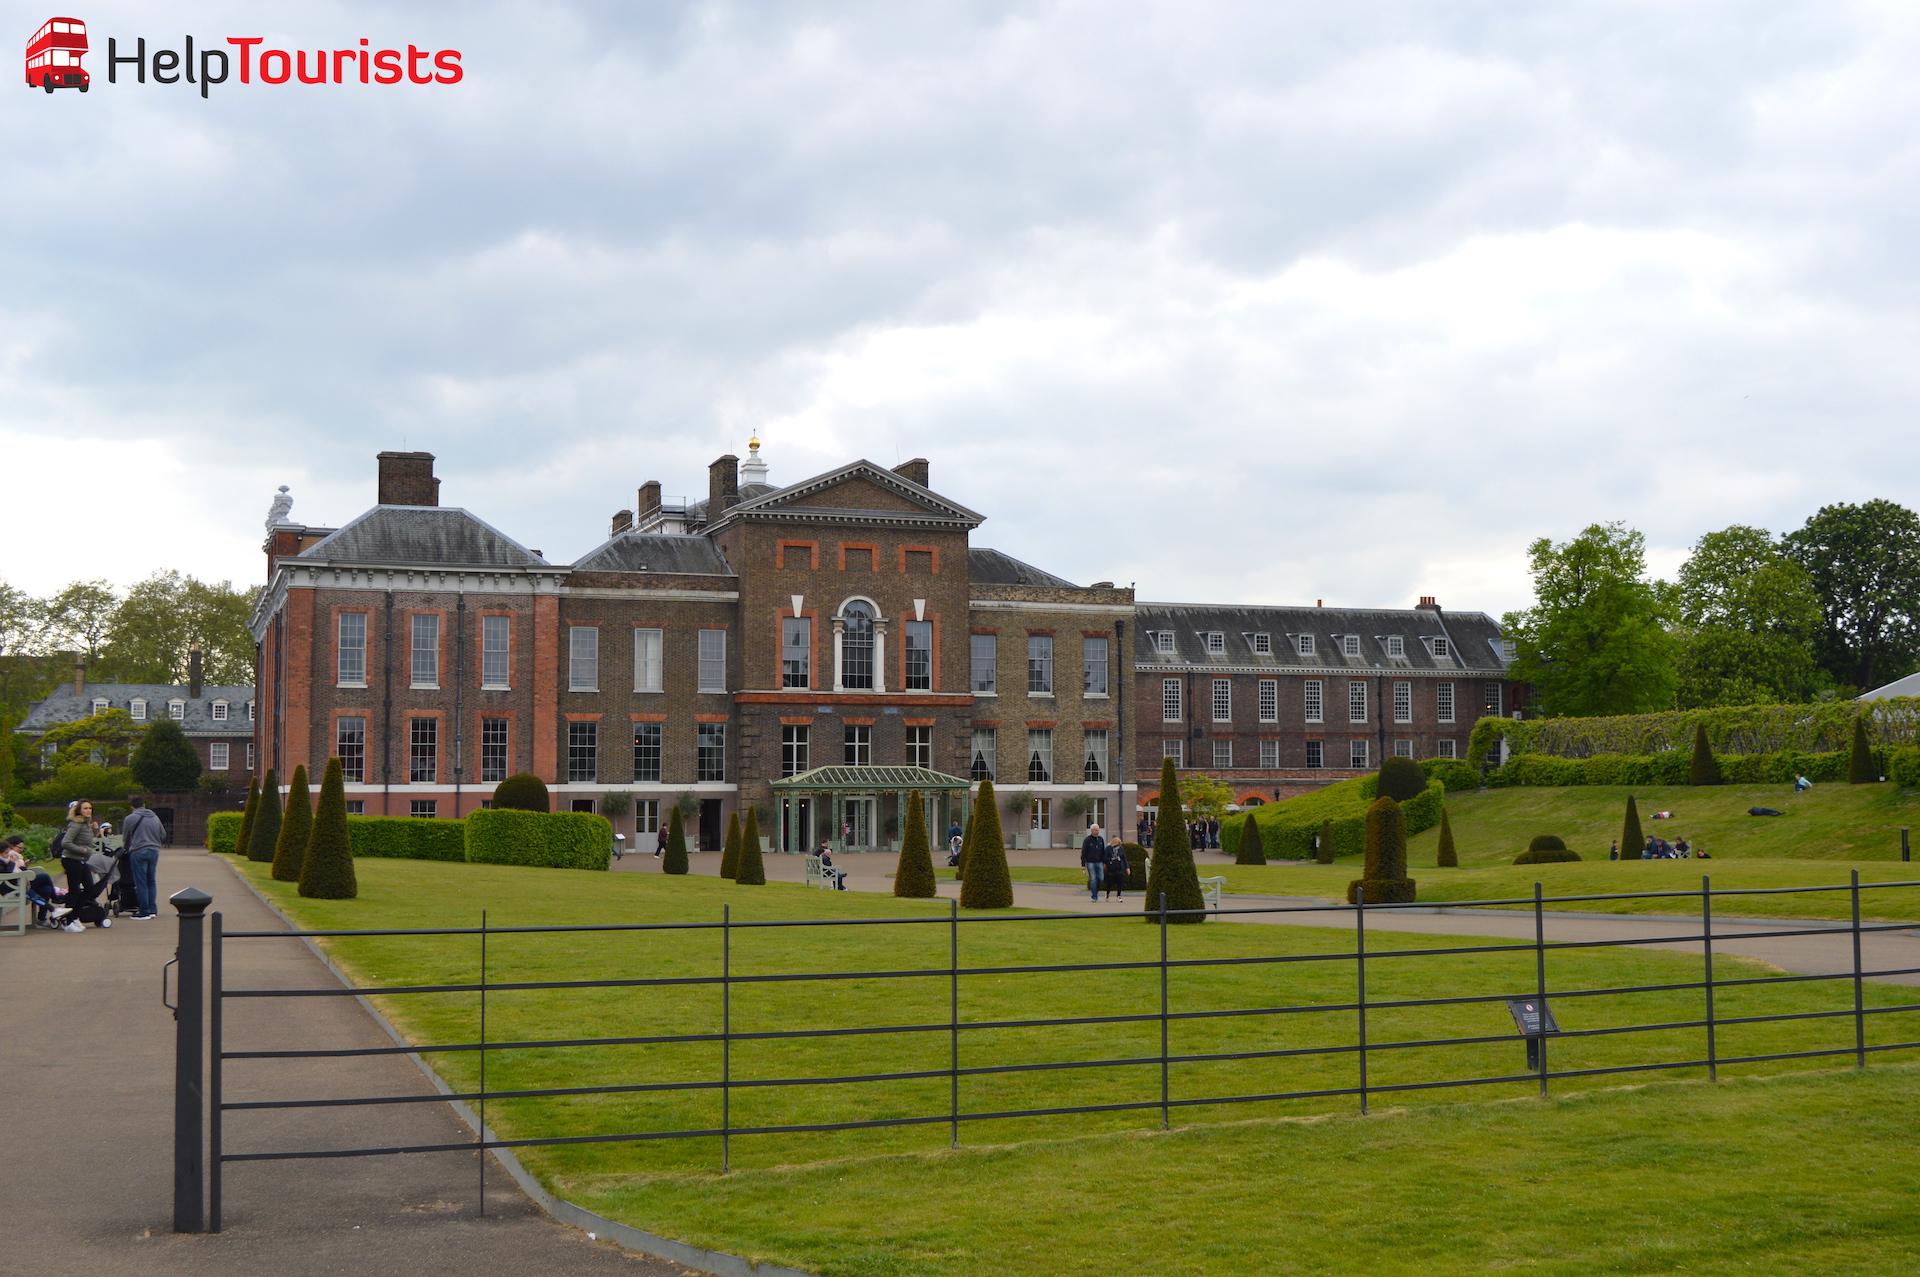 Kensington Palast in London